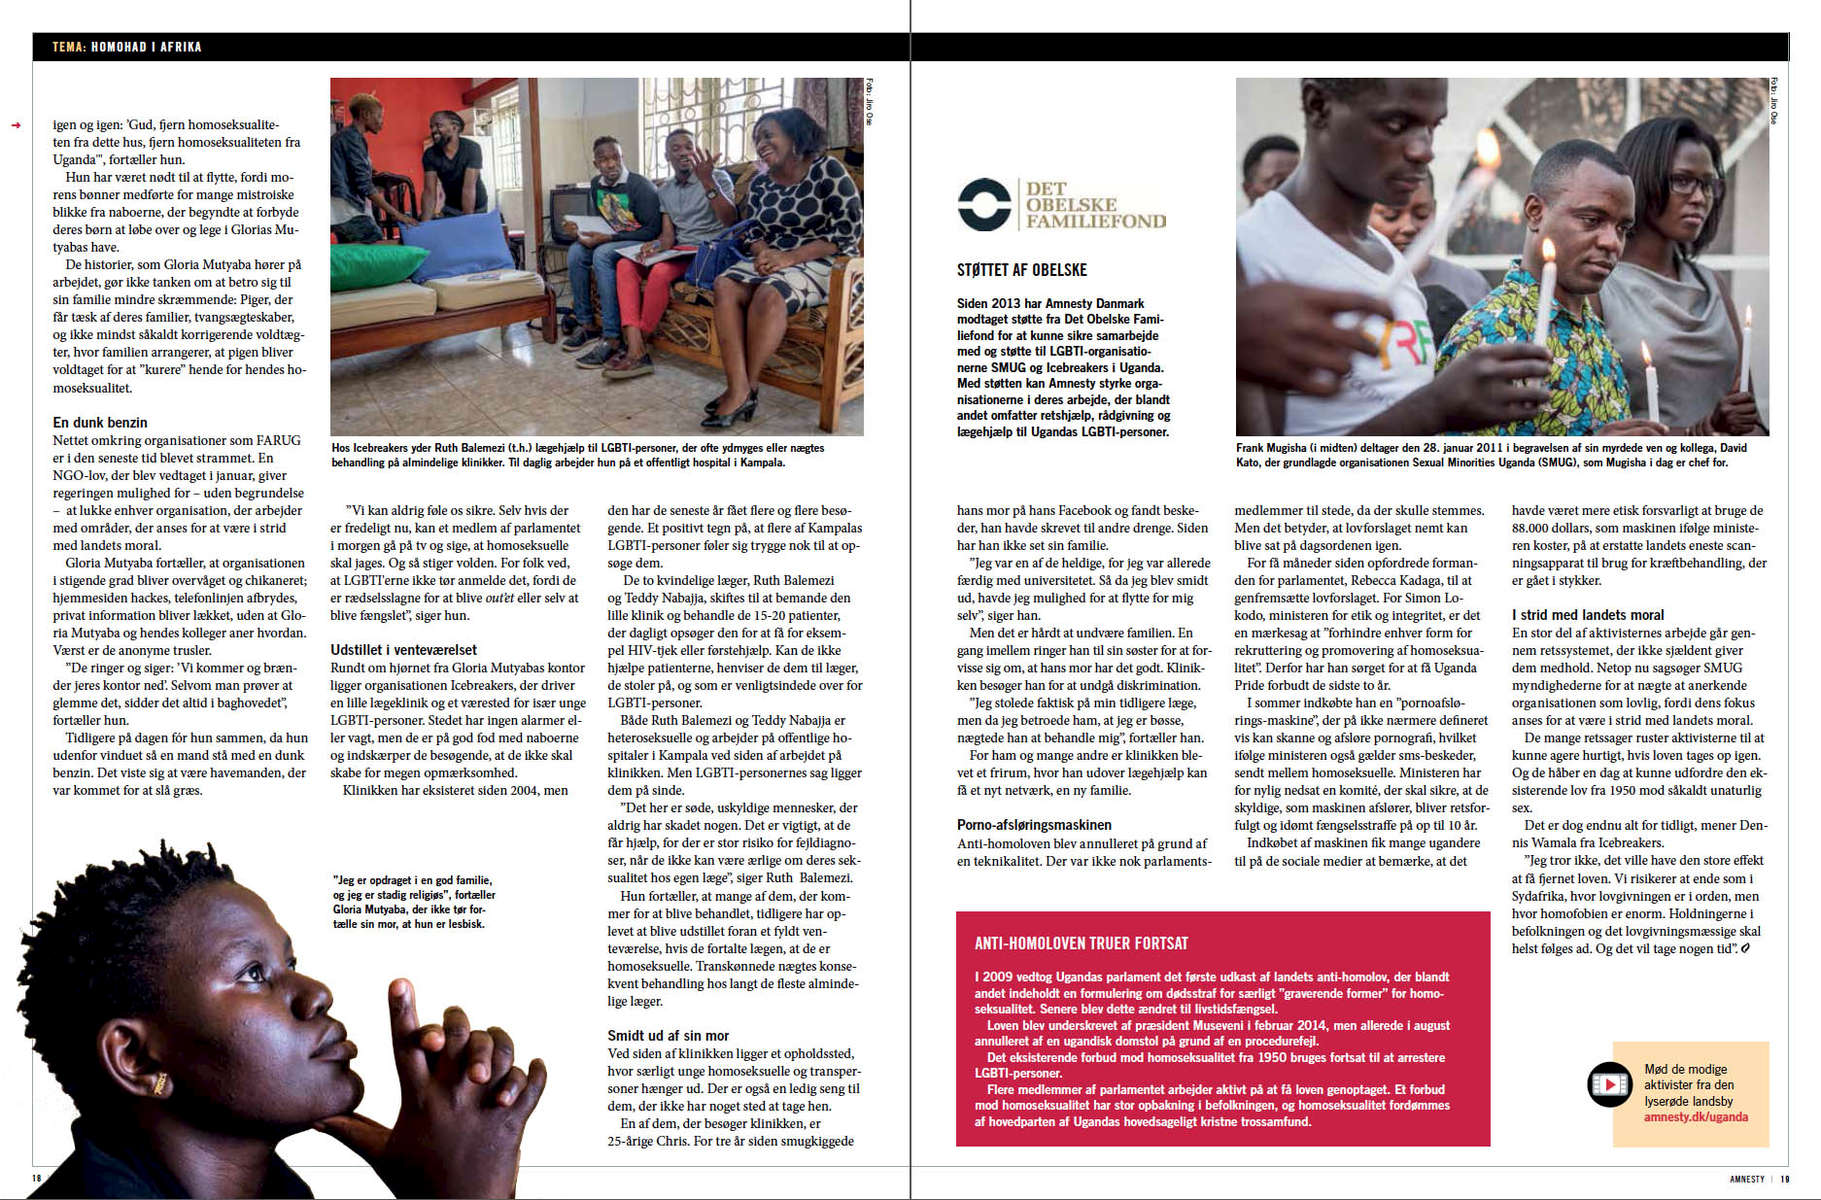 Amnesty International  - LGBT in Uganda - 03